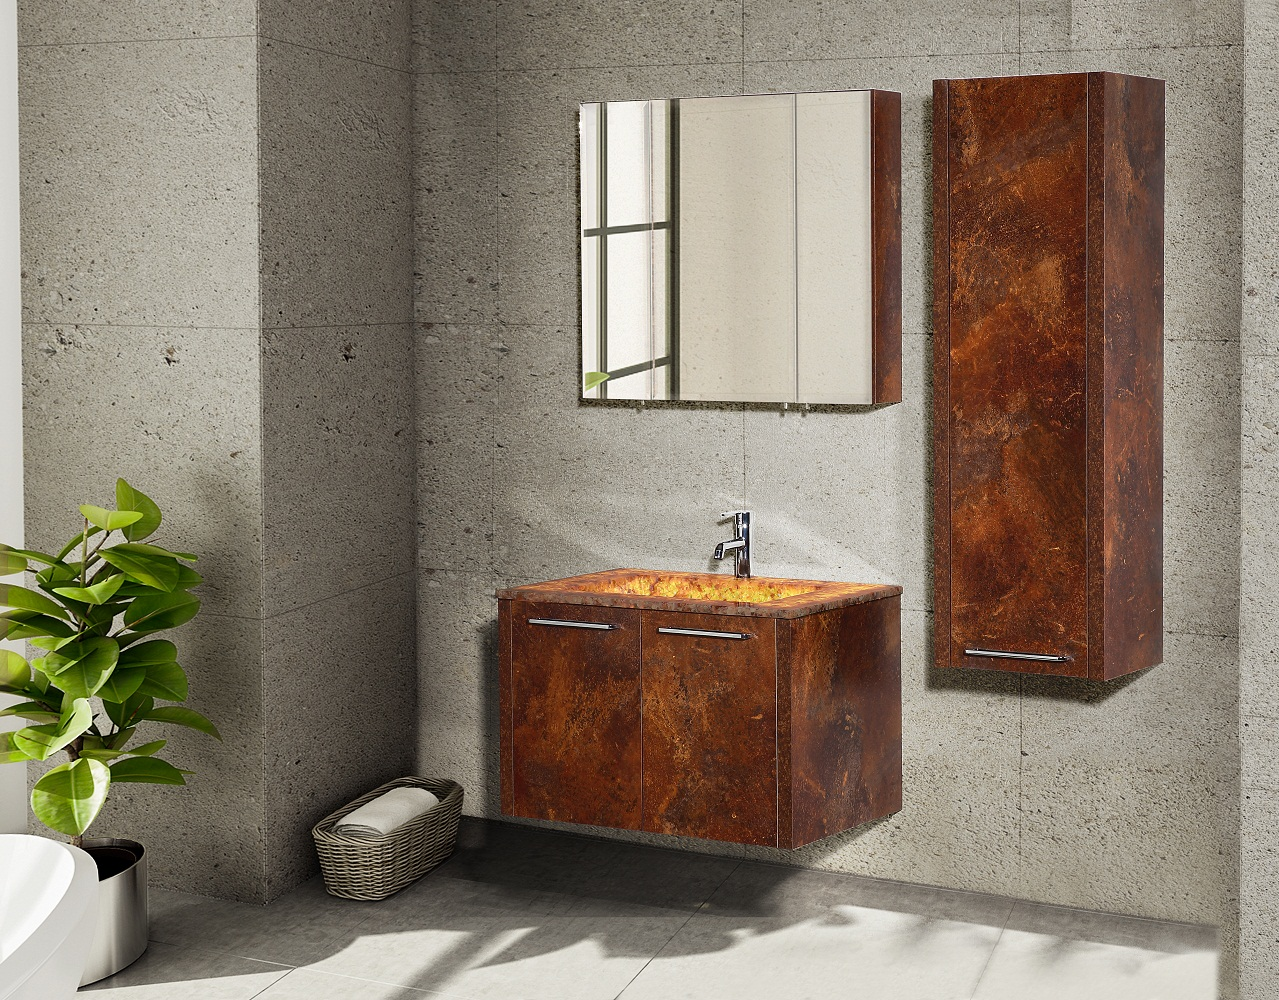 Casa Mare Pingo 32 Red Ceramic Cherry Oak Stonyx Design Bathroom Vanity With Dolamite Stone Single Sink And Wood Frame Mirror Home Designer Goods